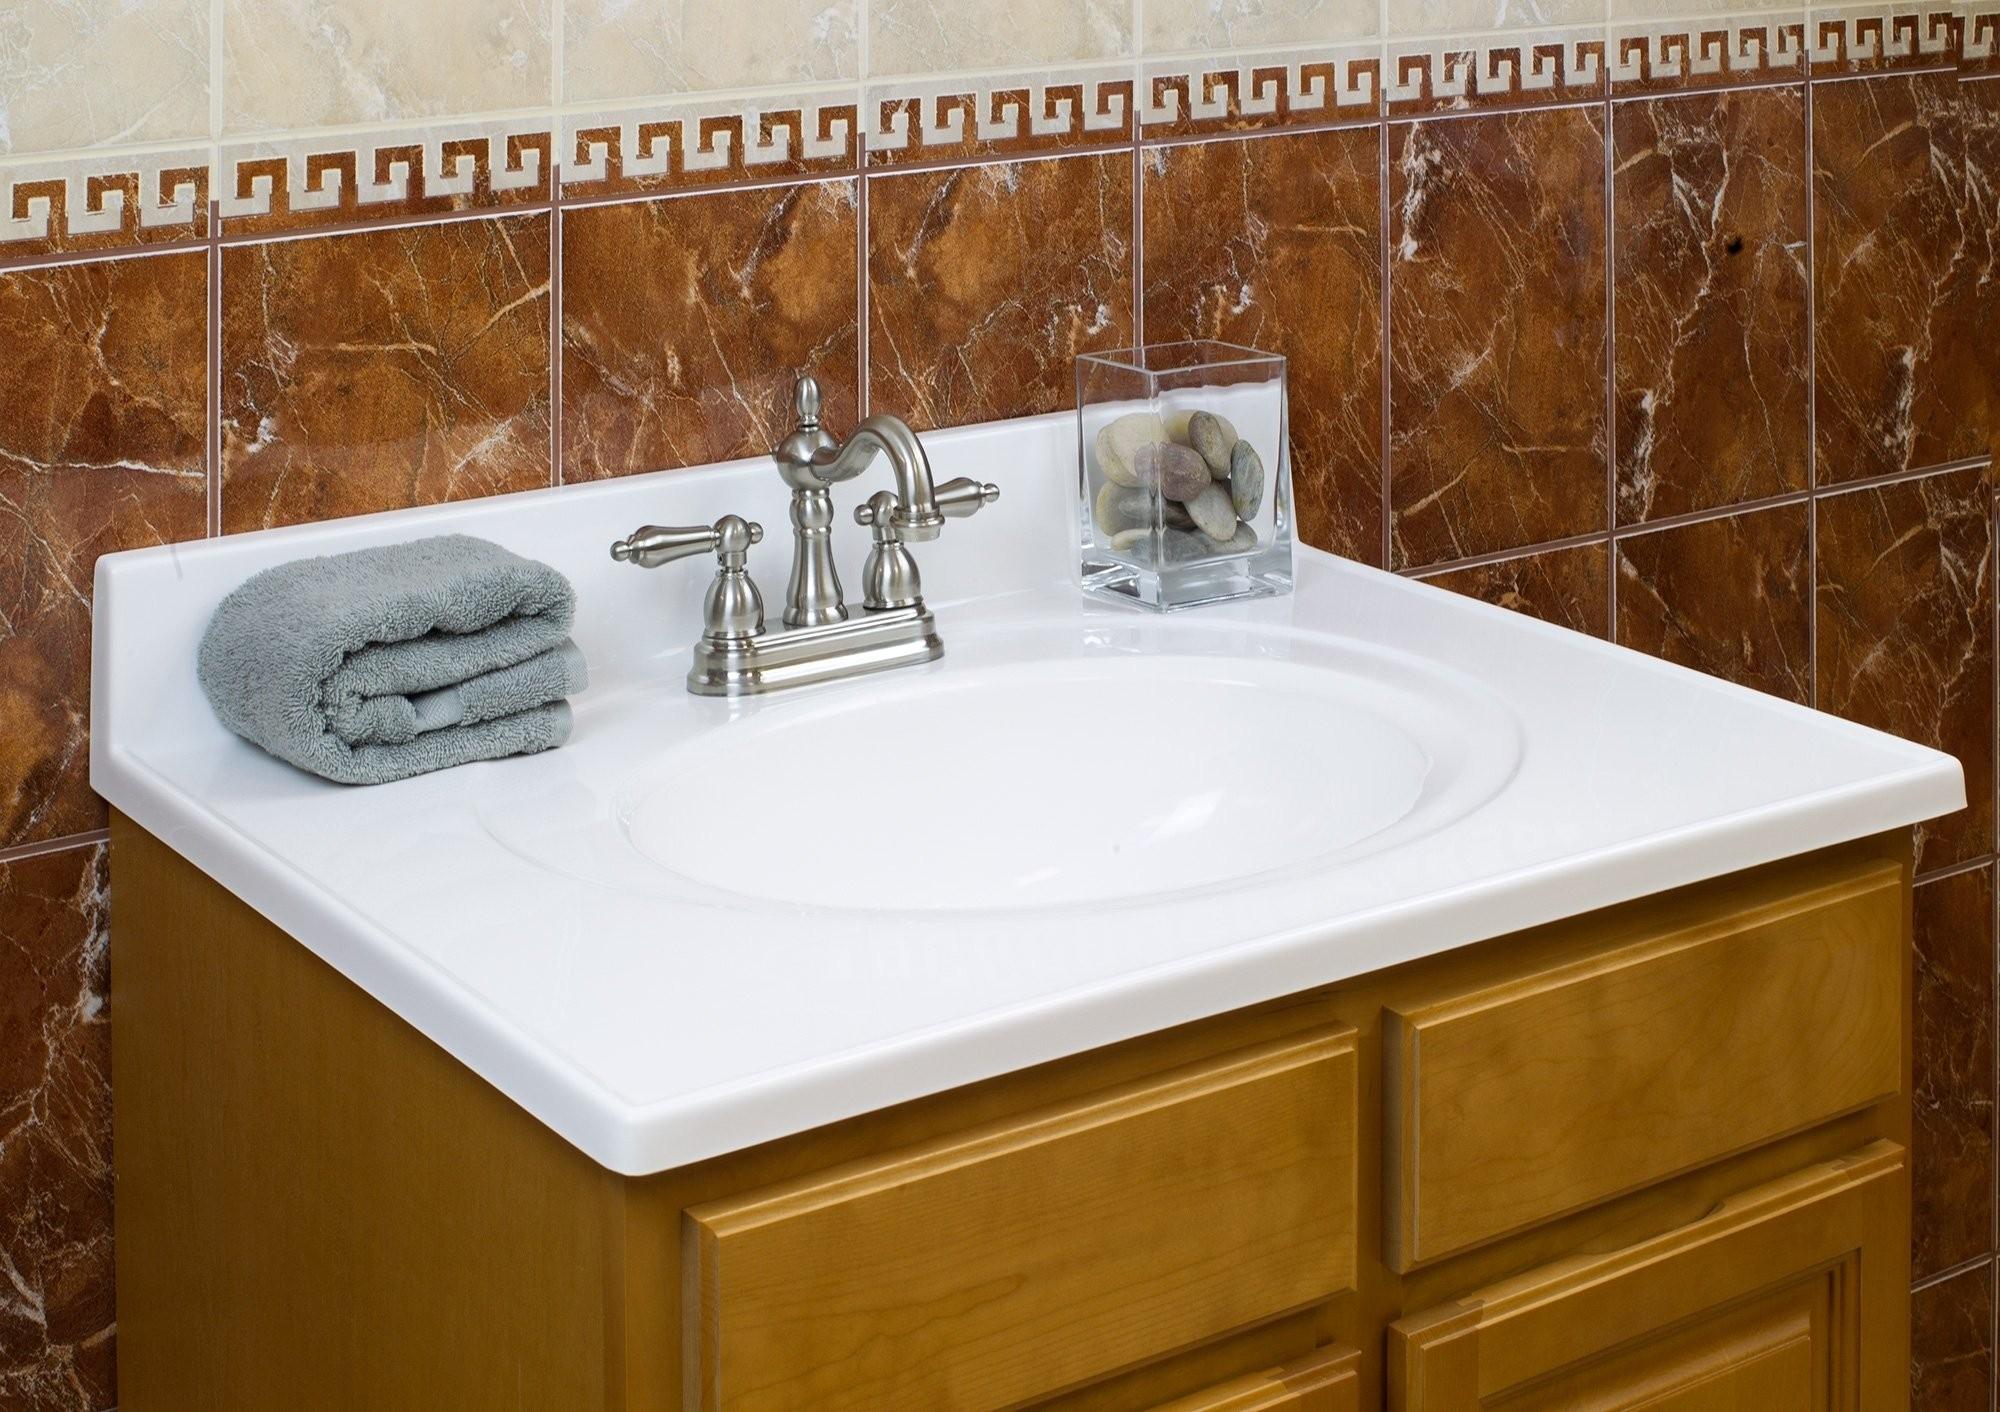 Bathroom Vanity top Best Lesscare Bathroom Vanity tops Cultured Marble with Bathroom Vanity Photograph